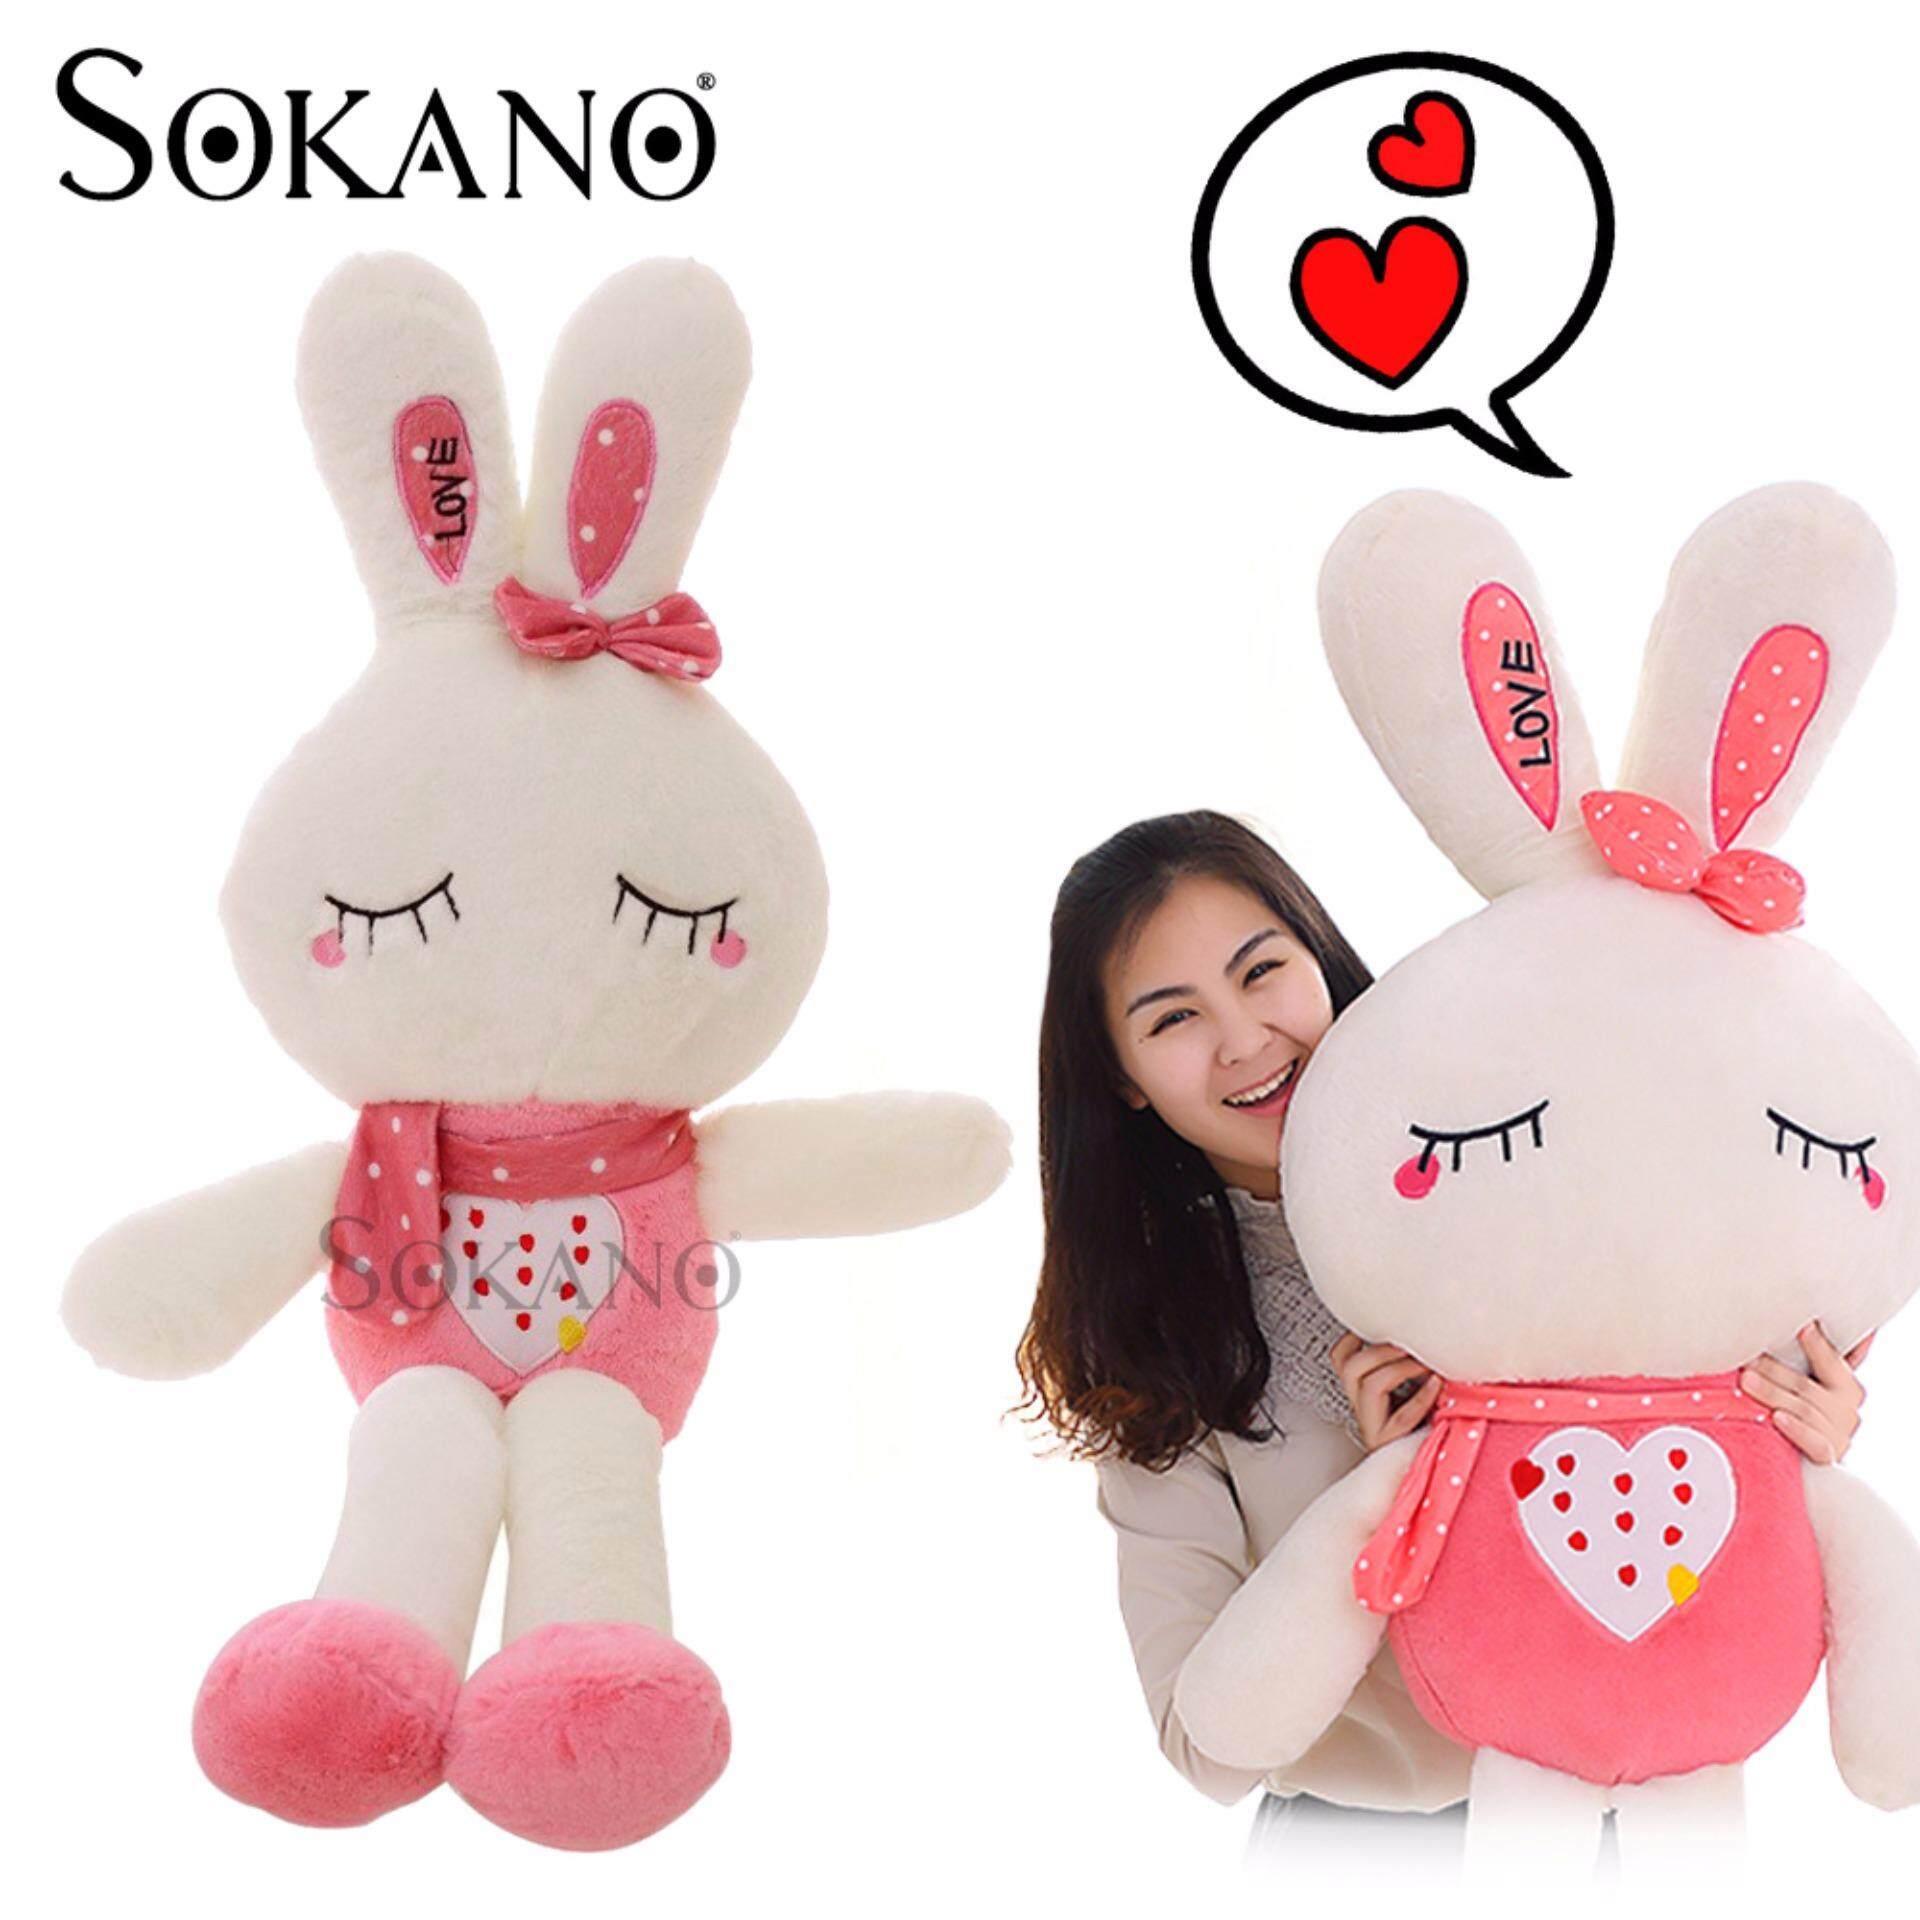 SOKANO 1 Meter Giant Lovely Rabbit Best Christmas, Birthday and Valentine Gift